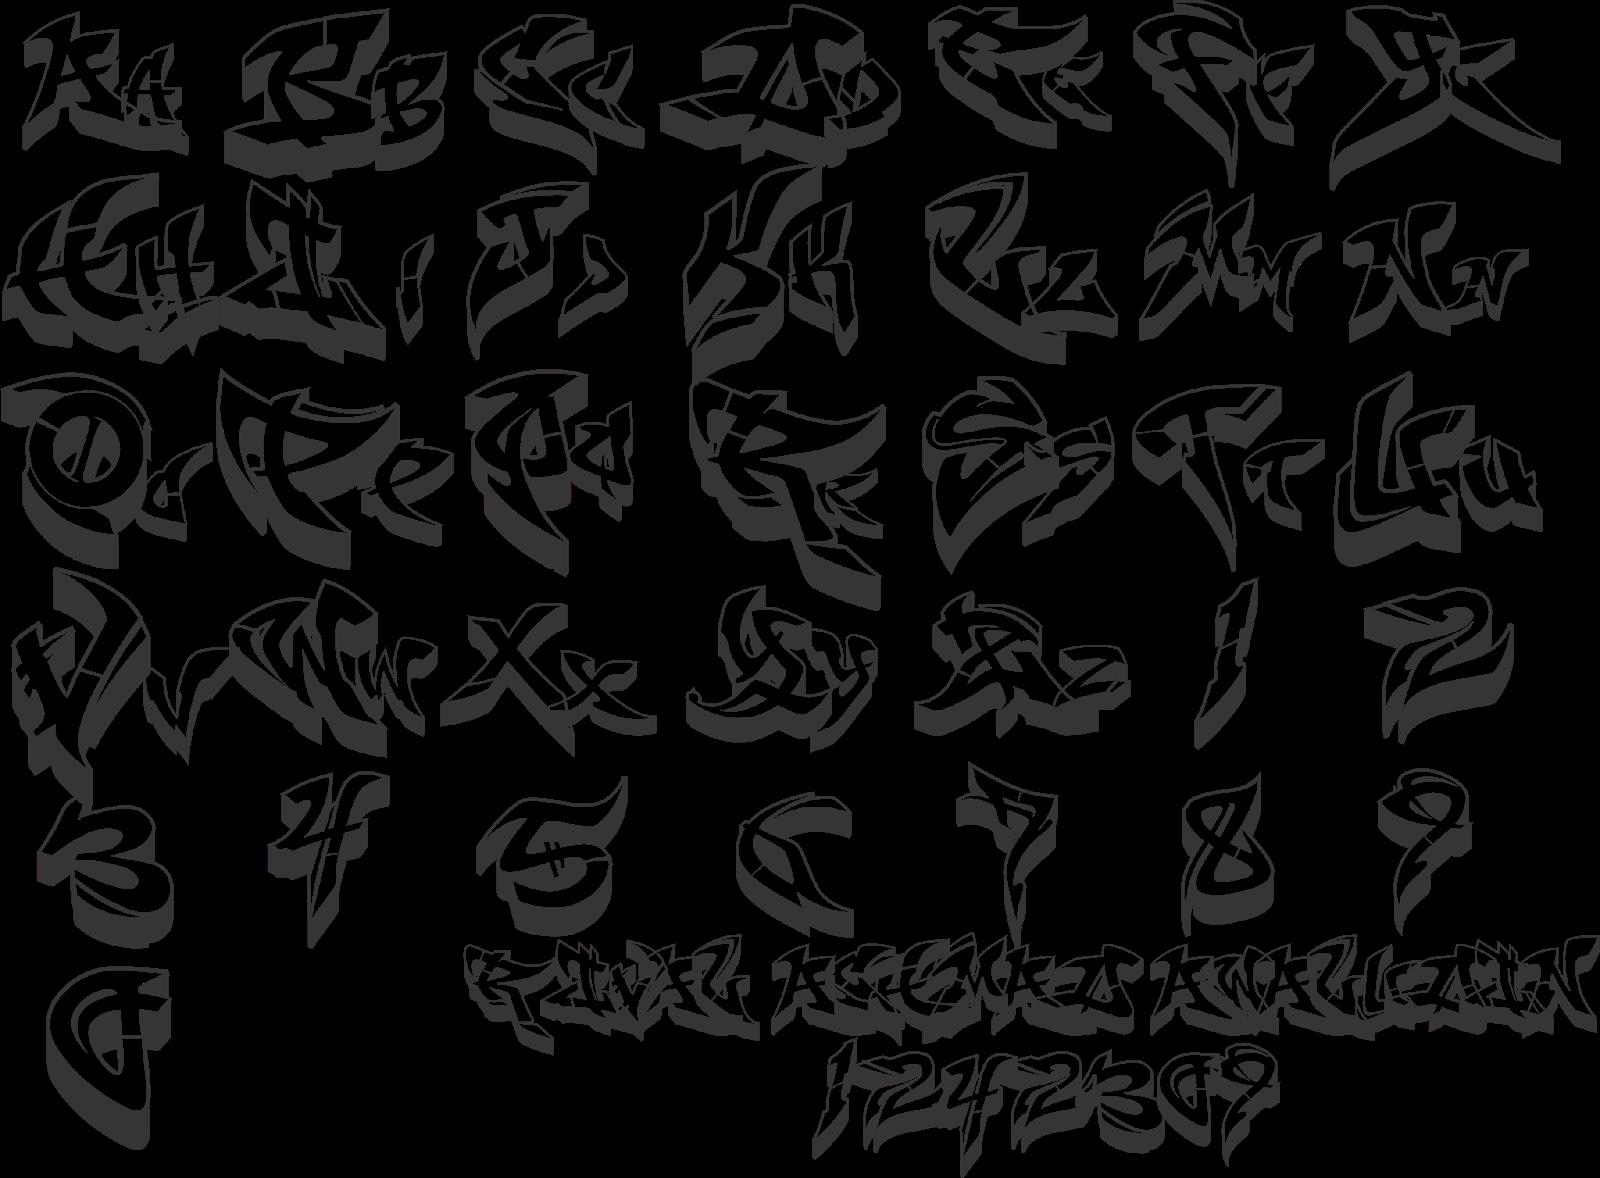 Huruf Abjad Grafity Keren | Search Results | Calendar 2015